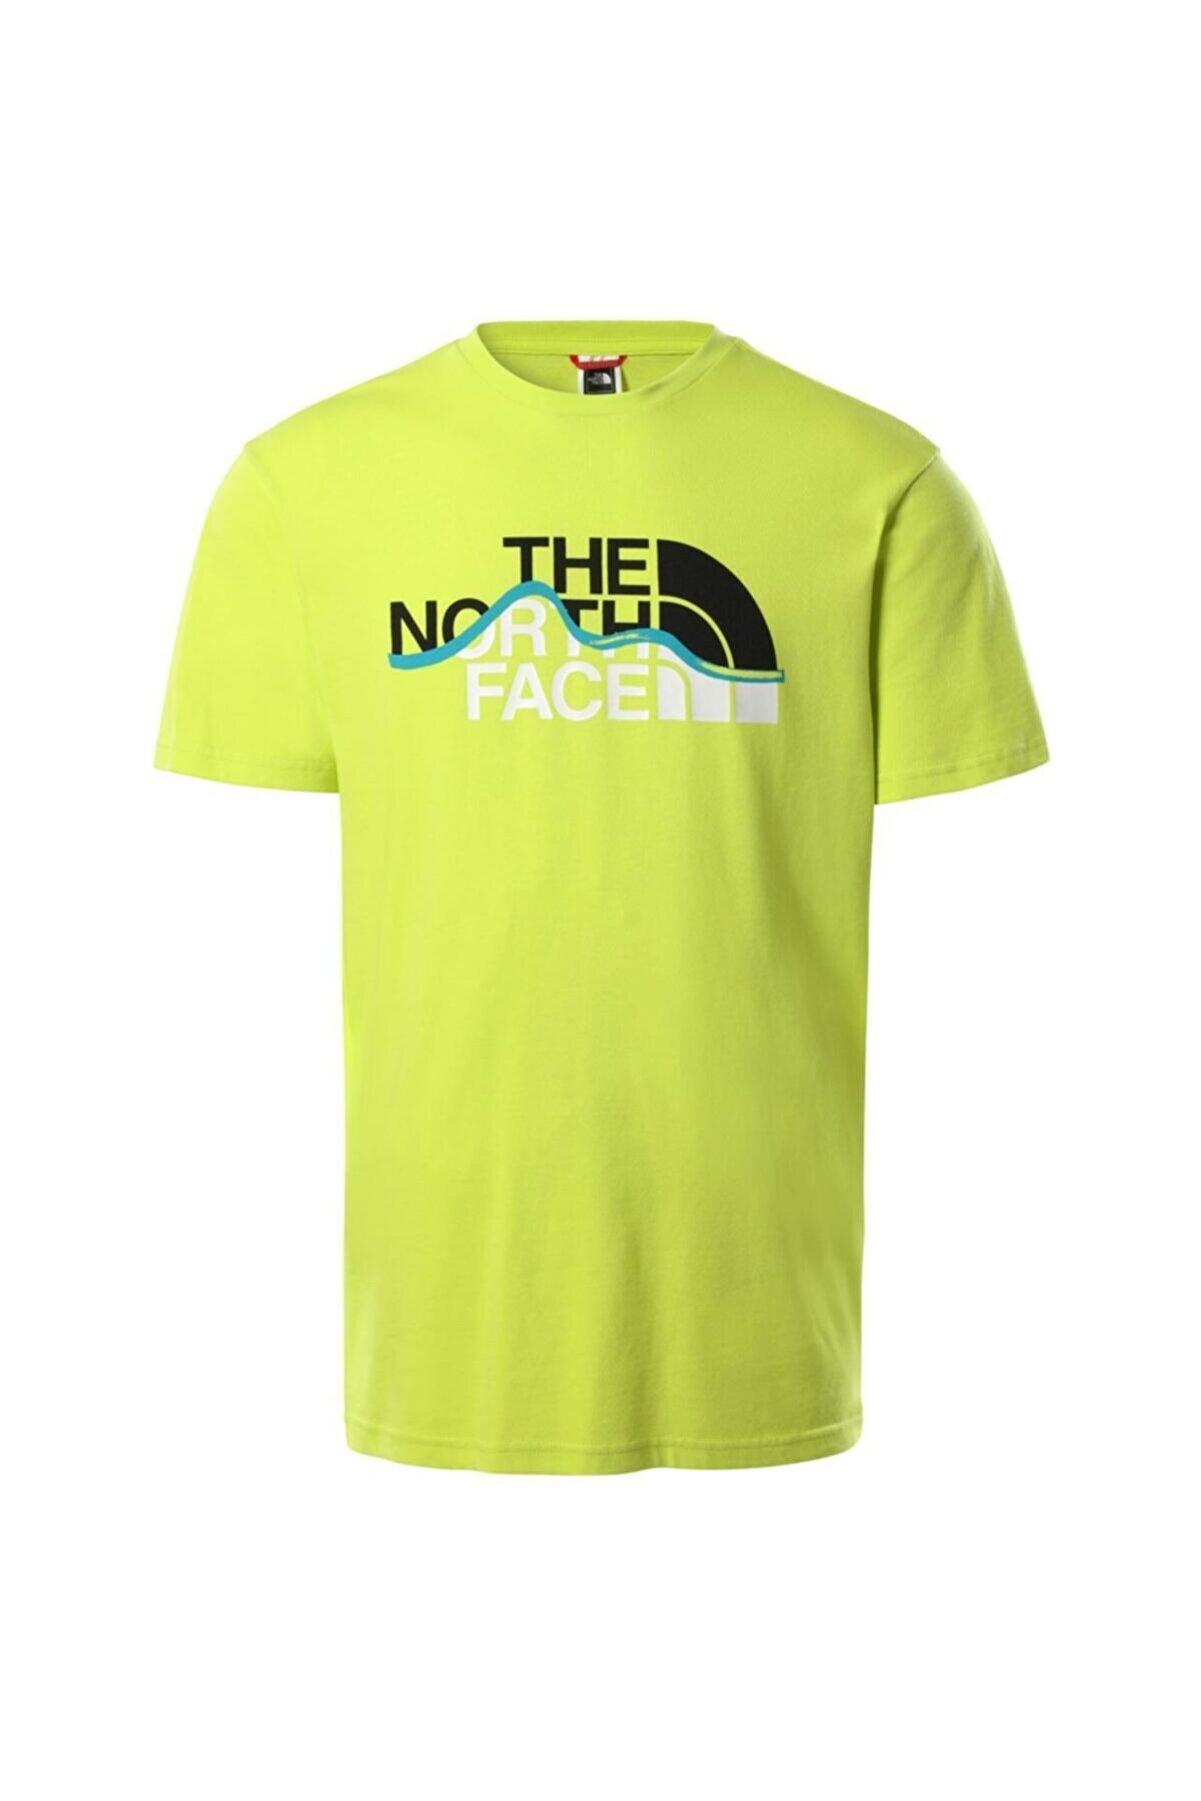 The North Face Nf00a3g2je31 M S-s Mountaın Lıne Tee - Eu Erkek T-shirt